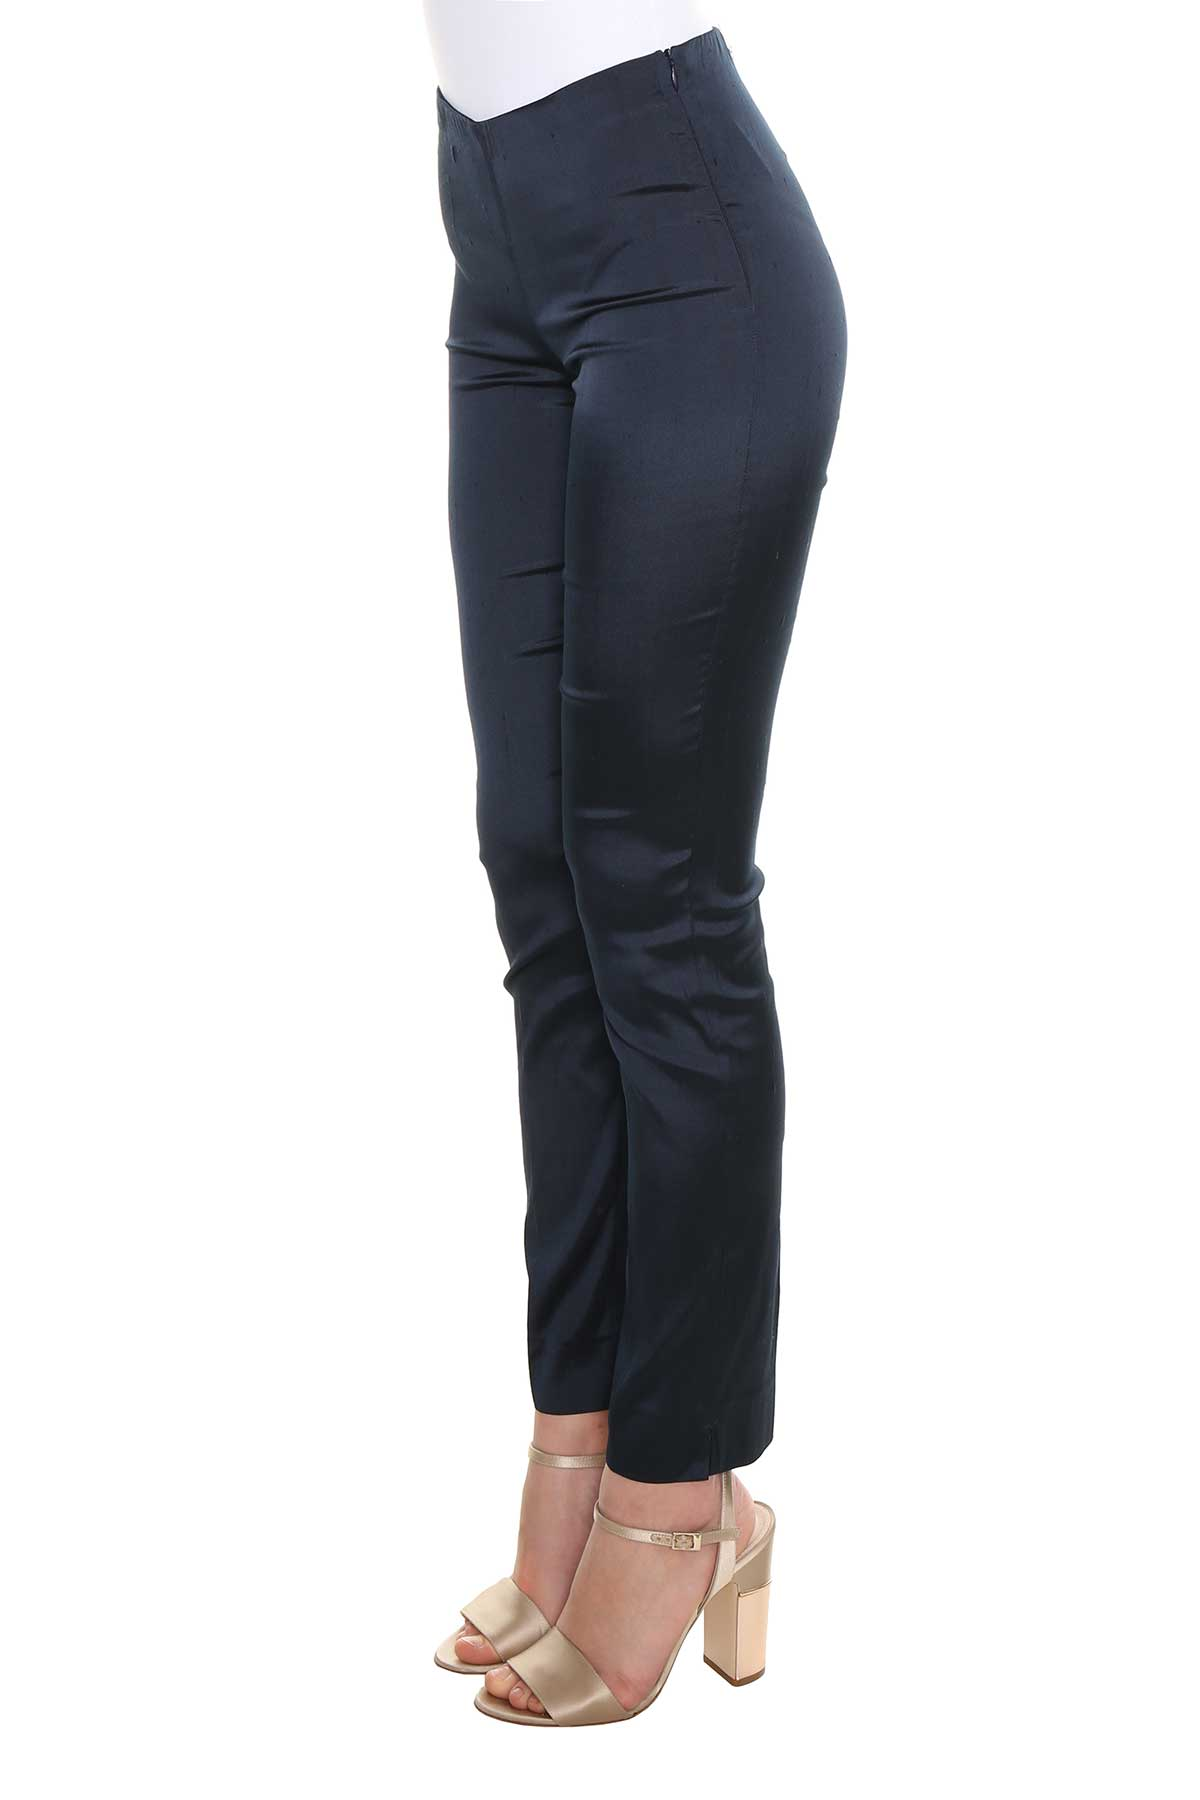 Pantalon Shantung Parosh v2sIpmW3iq